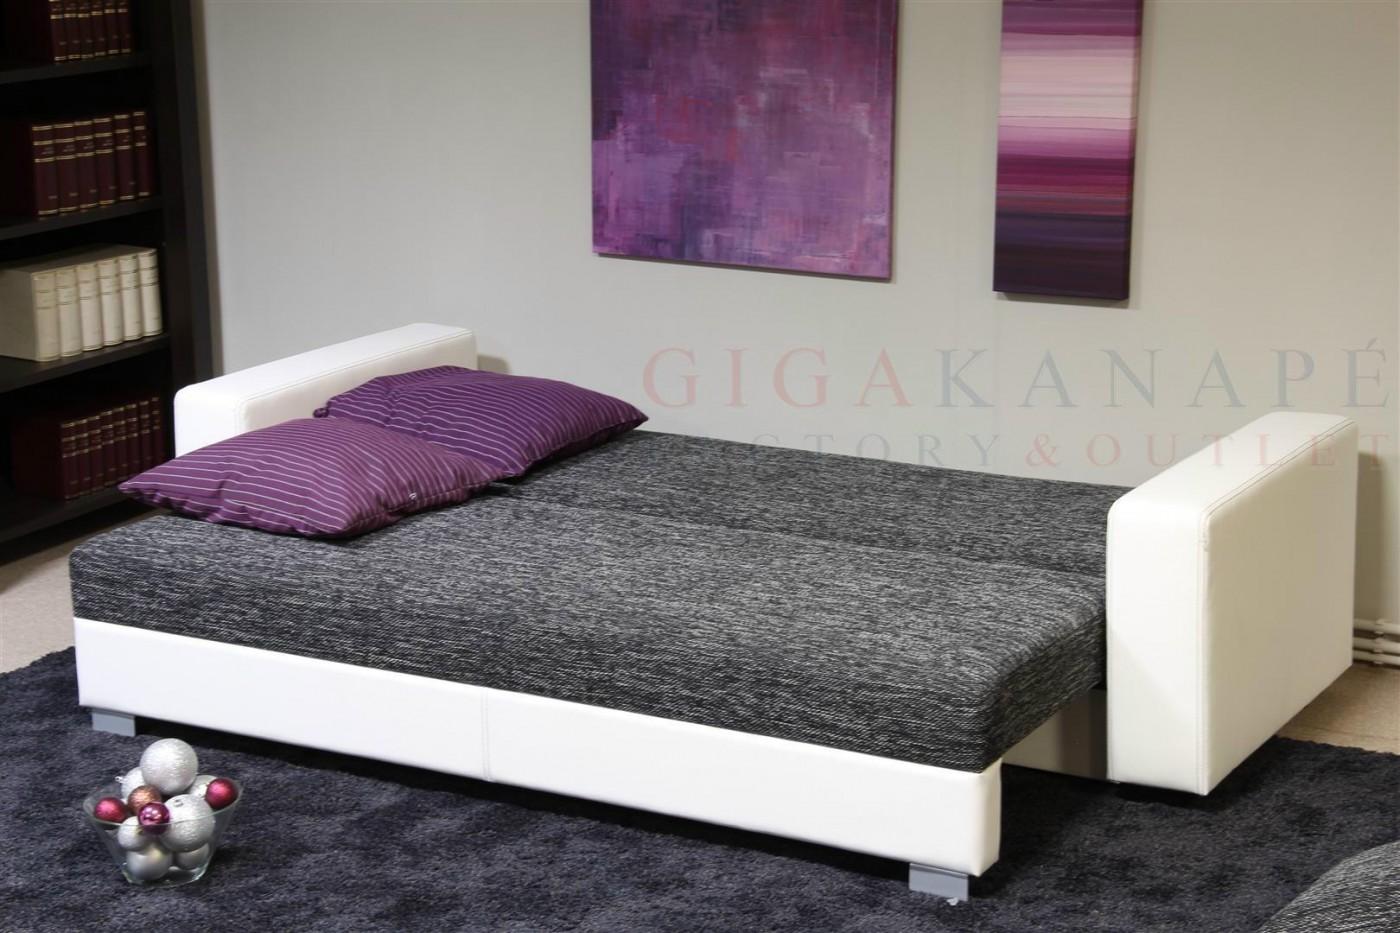 London kárpitos kanapéágy : GigaKanapé